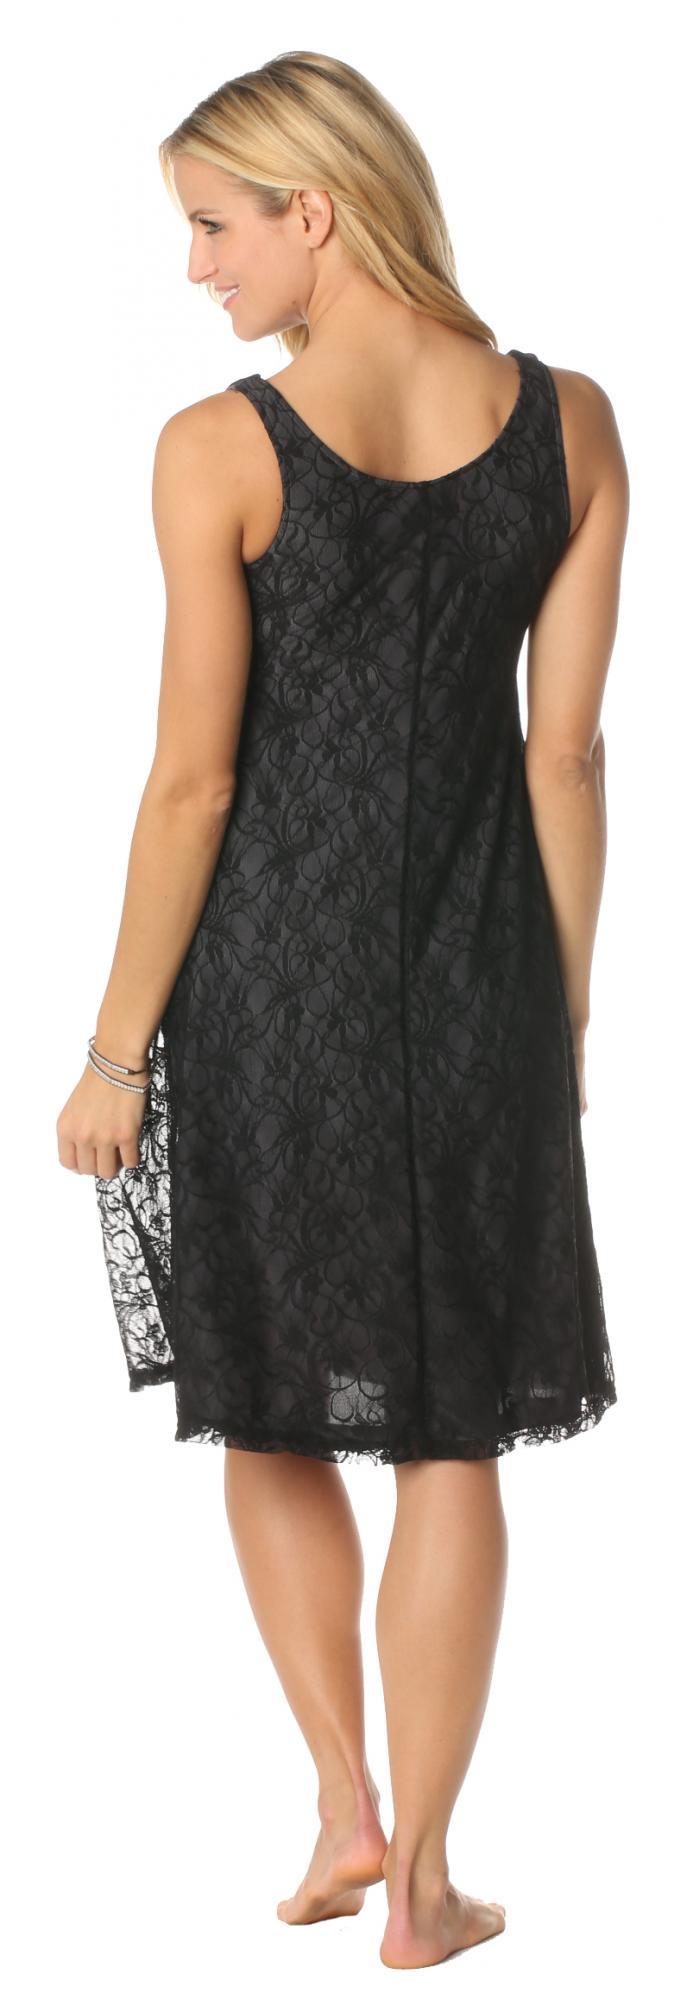 majamas-market-nursing-dress-blacklace-back.jpg